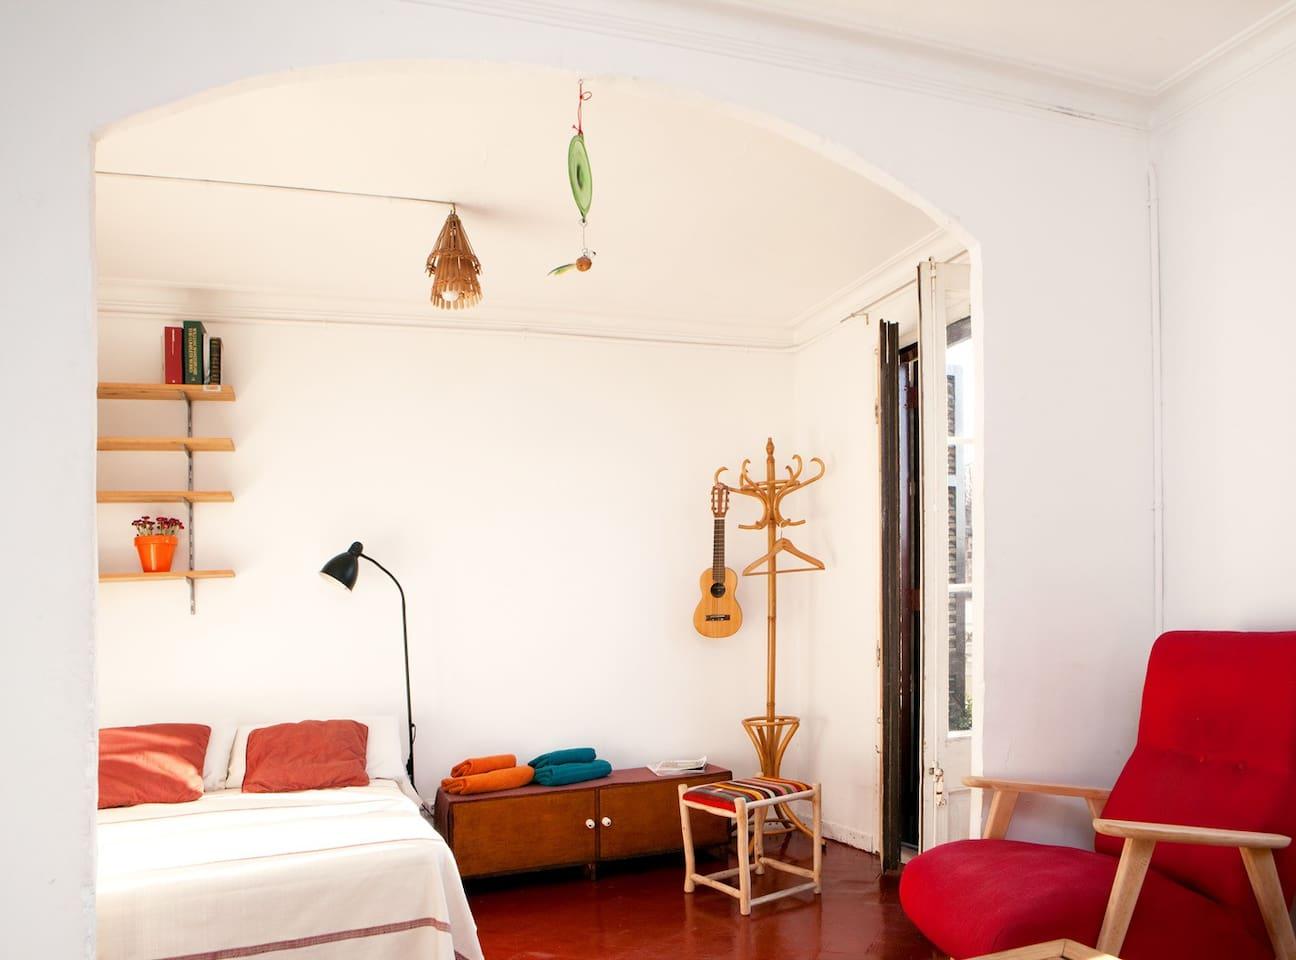 Bedroom with its own little livingroom / Dormitorio con su propio saloncito